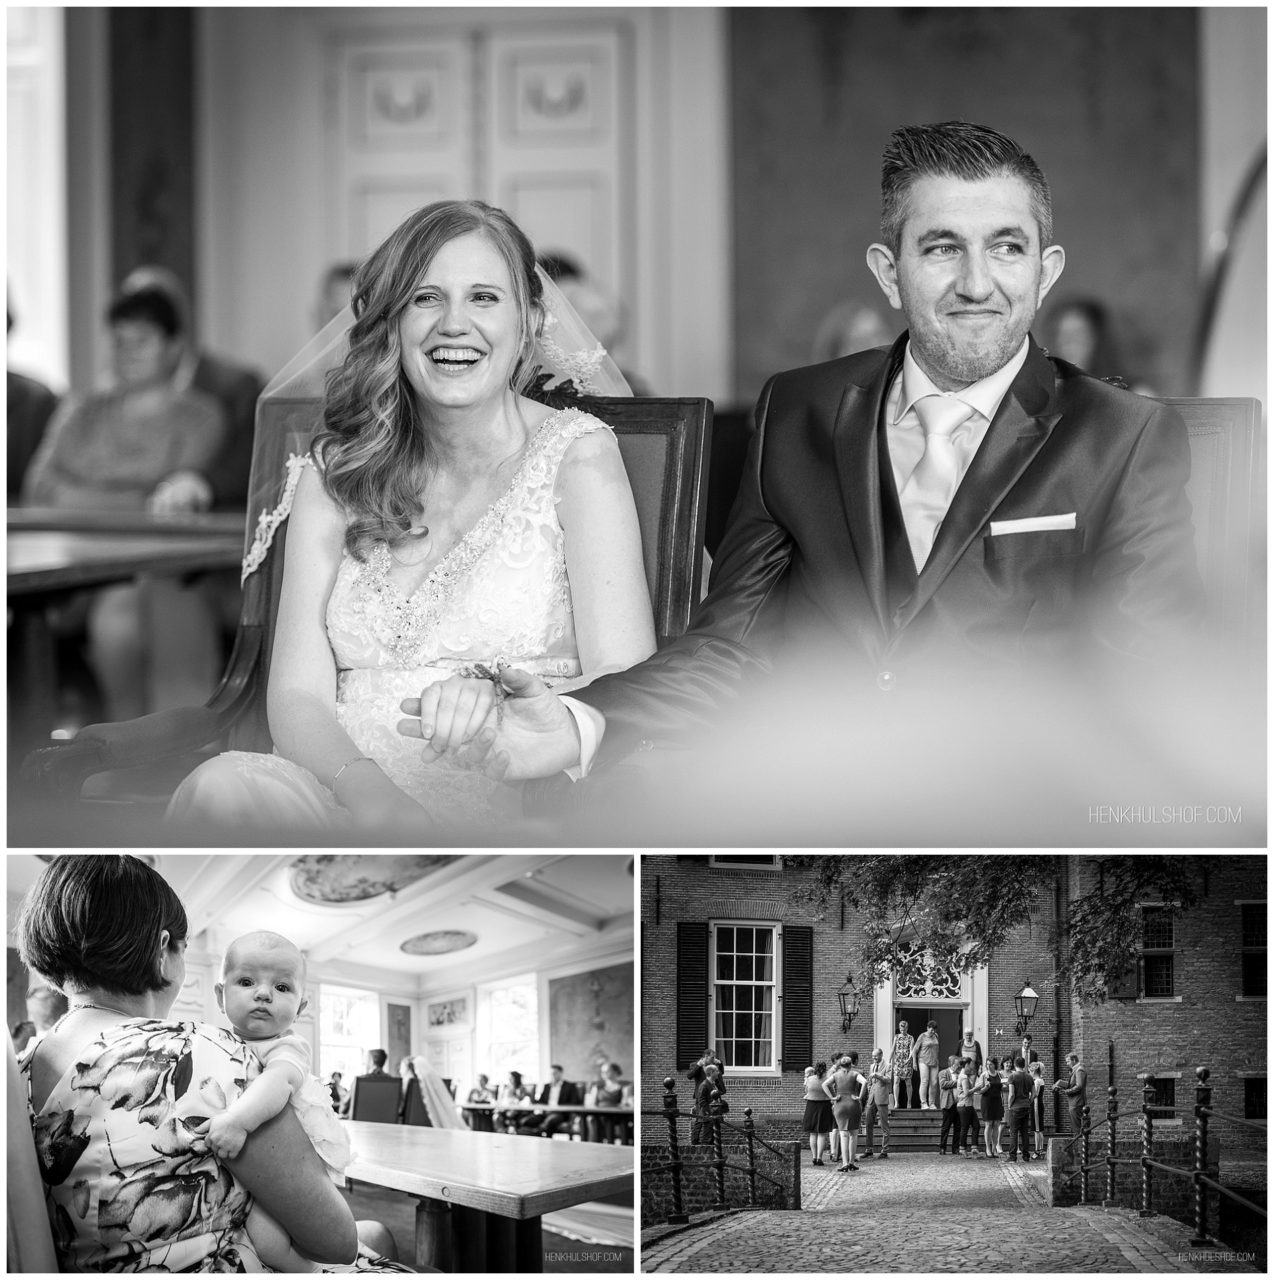 huwelijk Bemmel fotograaf